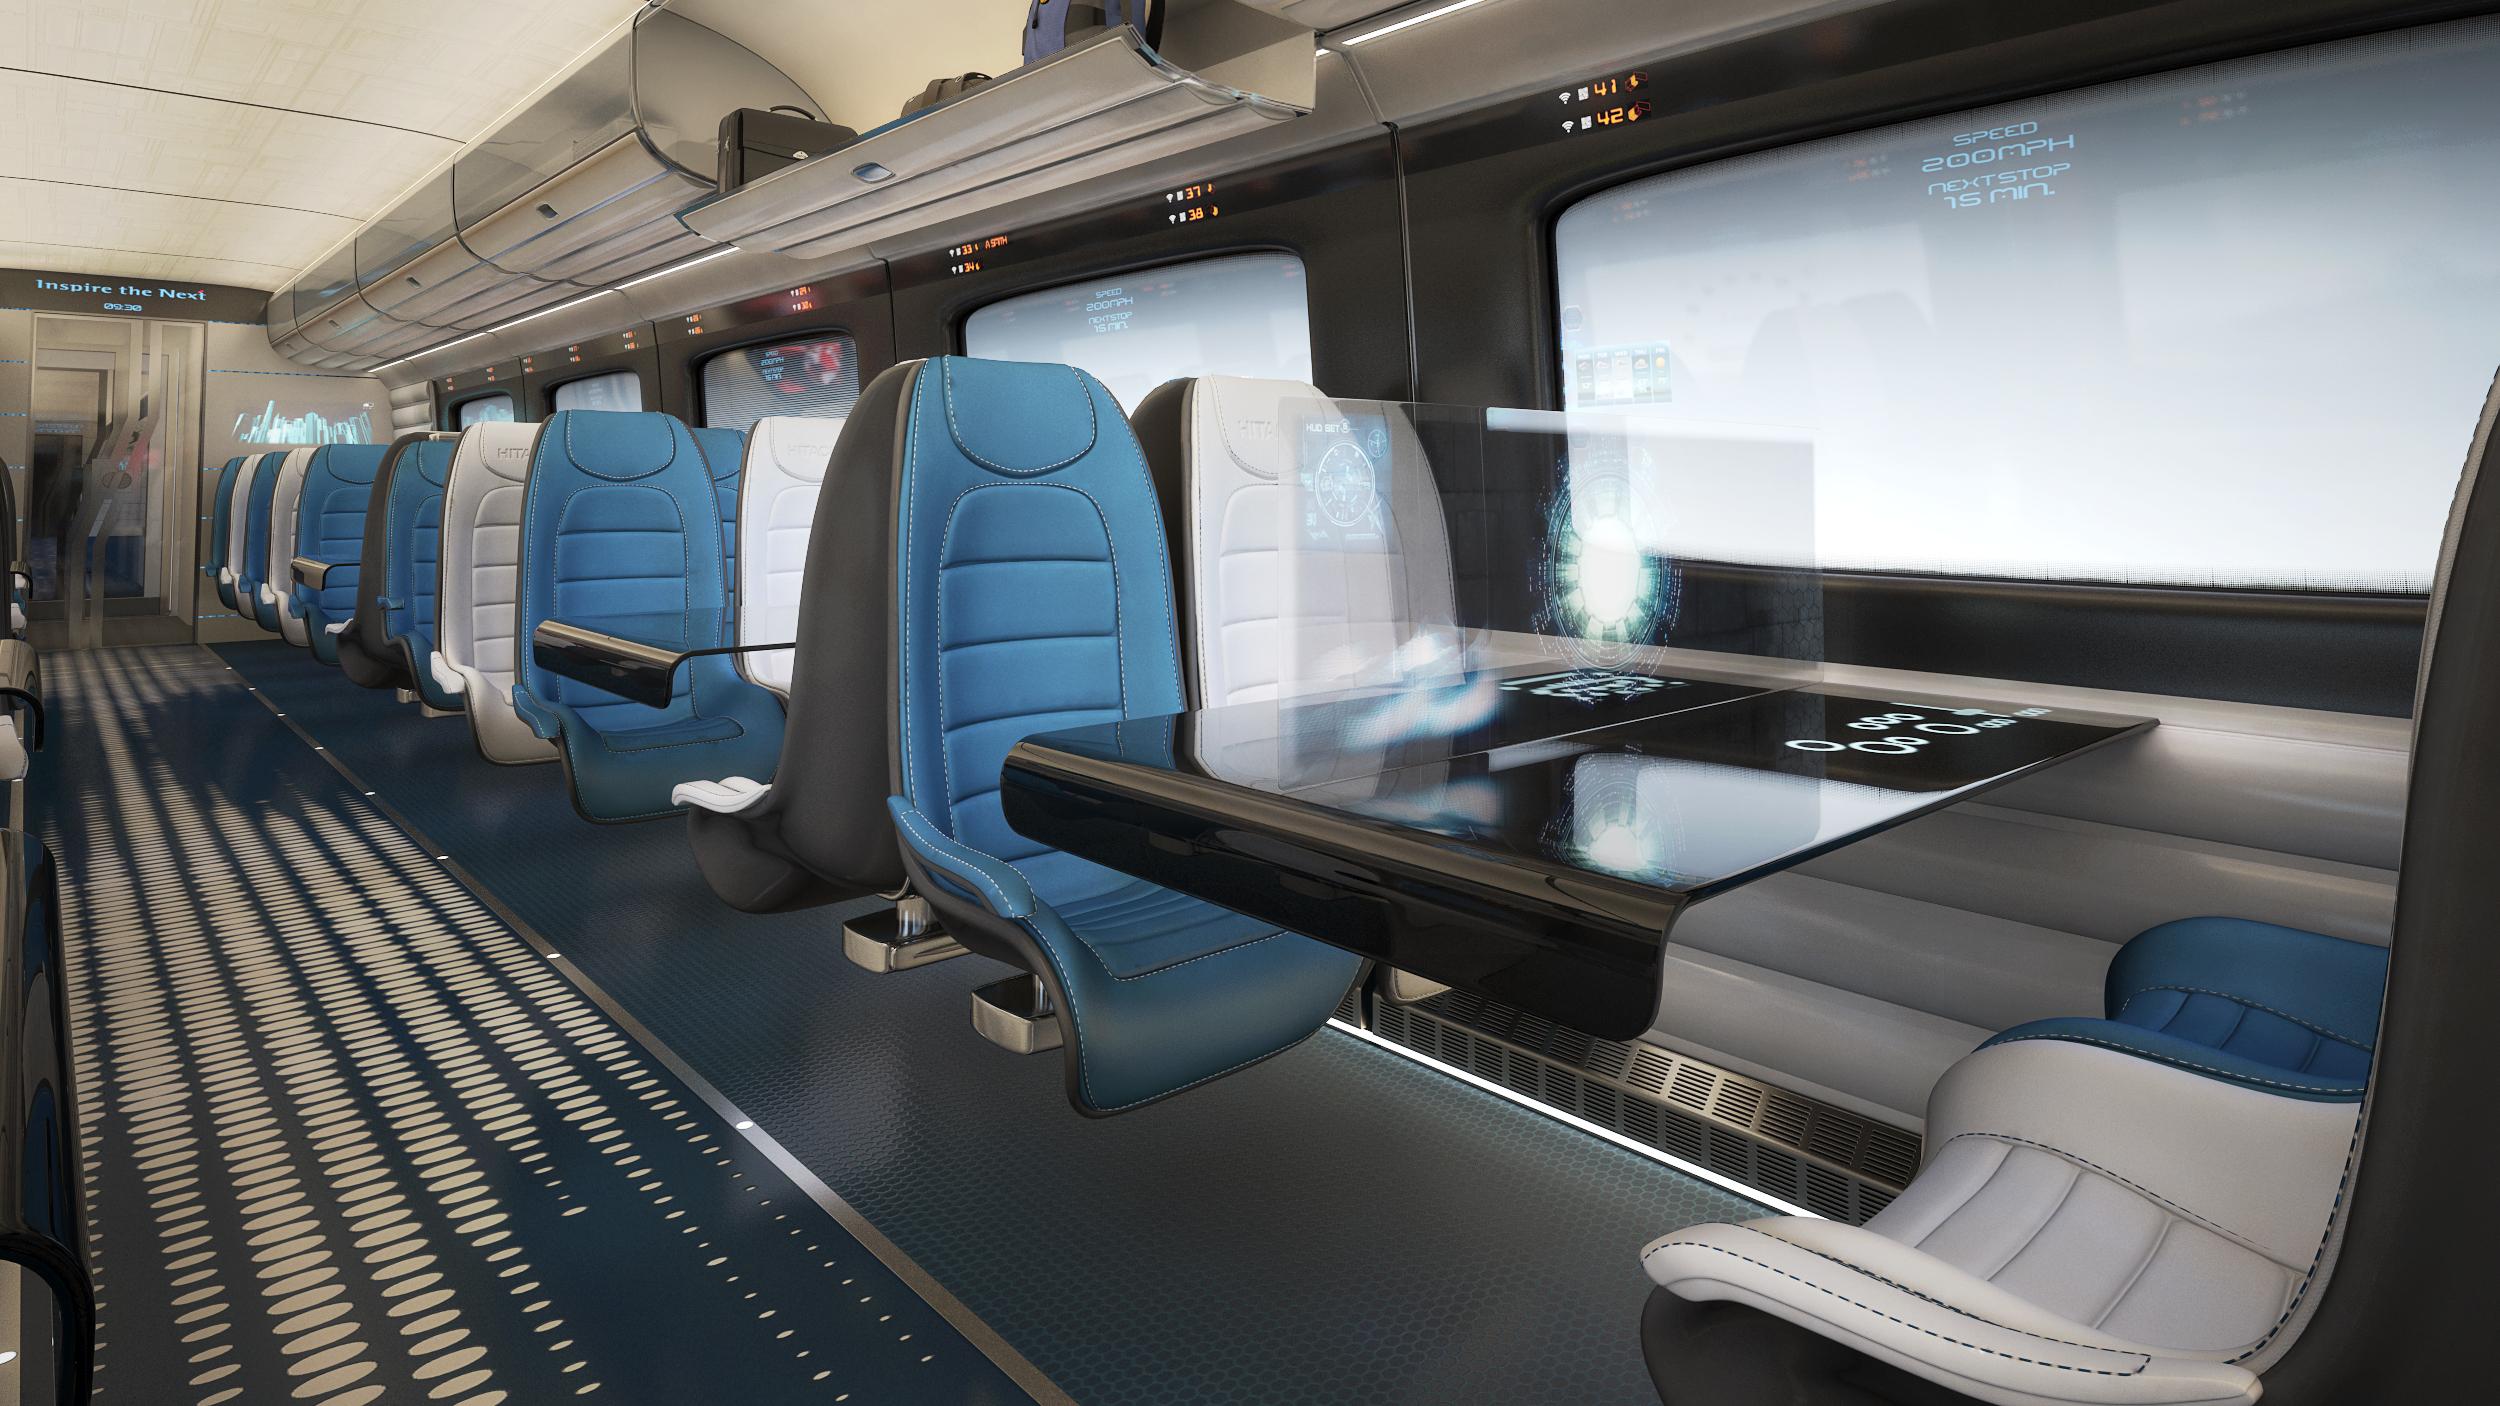 Cabin Bathroom Designs Hitachi Rail Europe Reveals New High Speed Train Interior